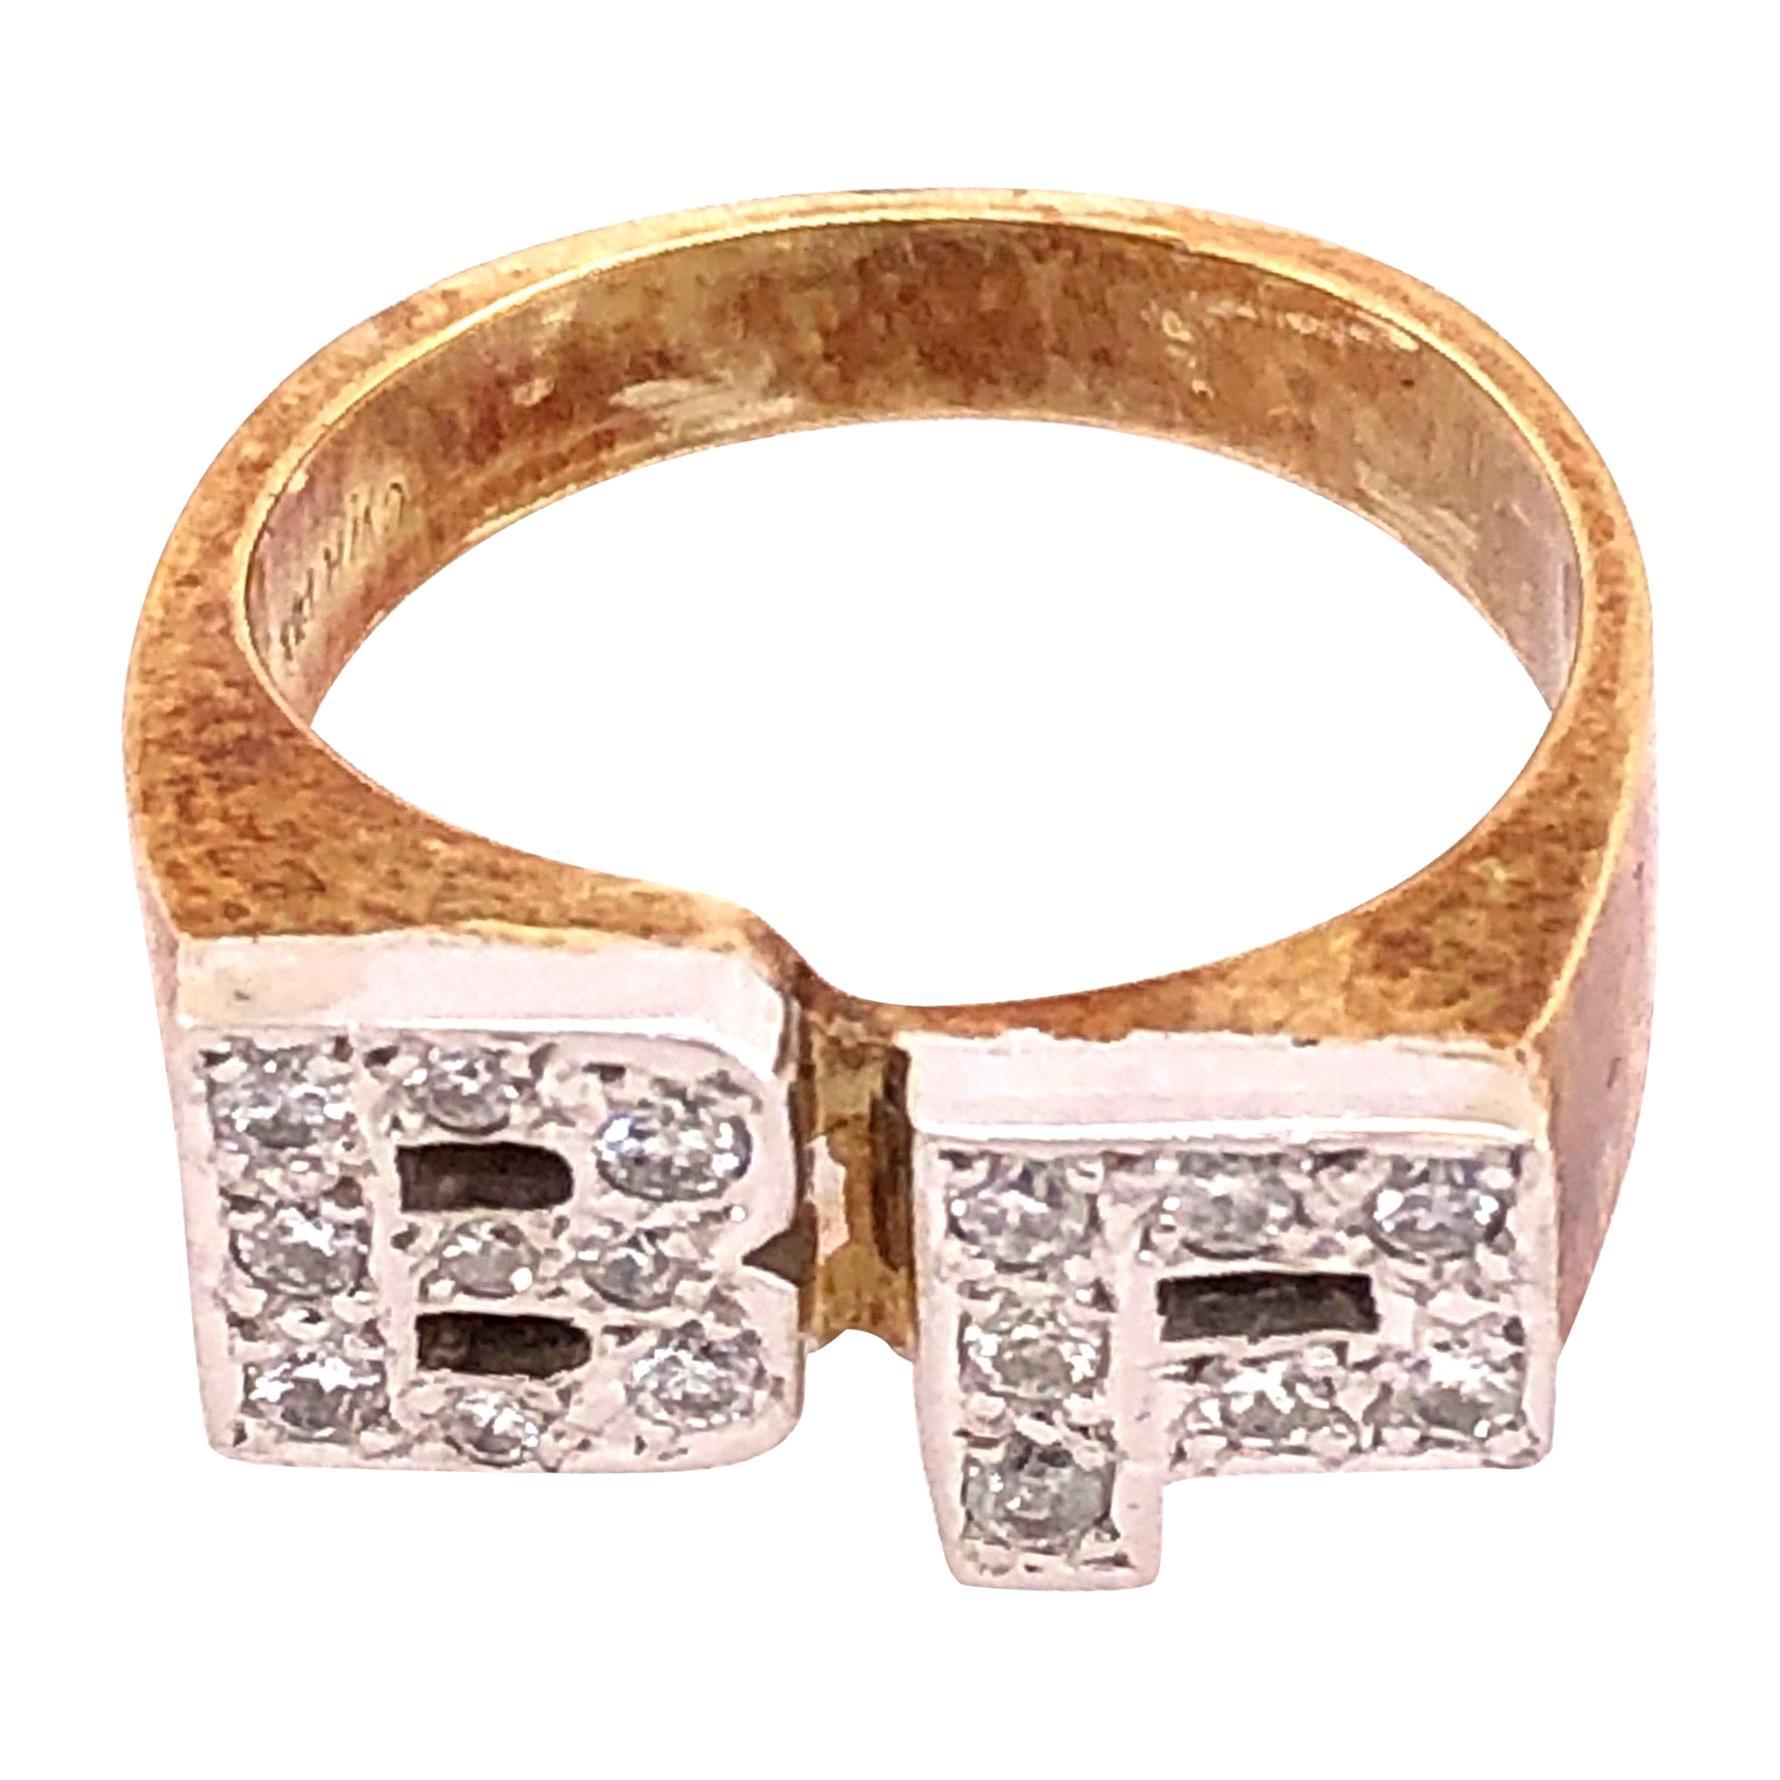 14 Karat White and Yellow Gold and Diamond BP Initial Ring